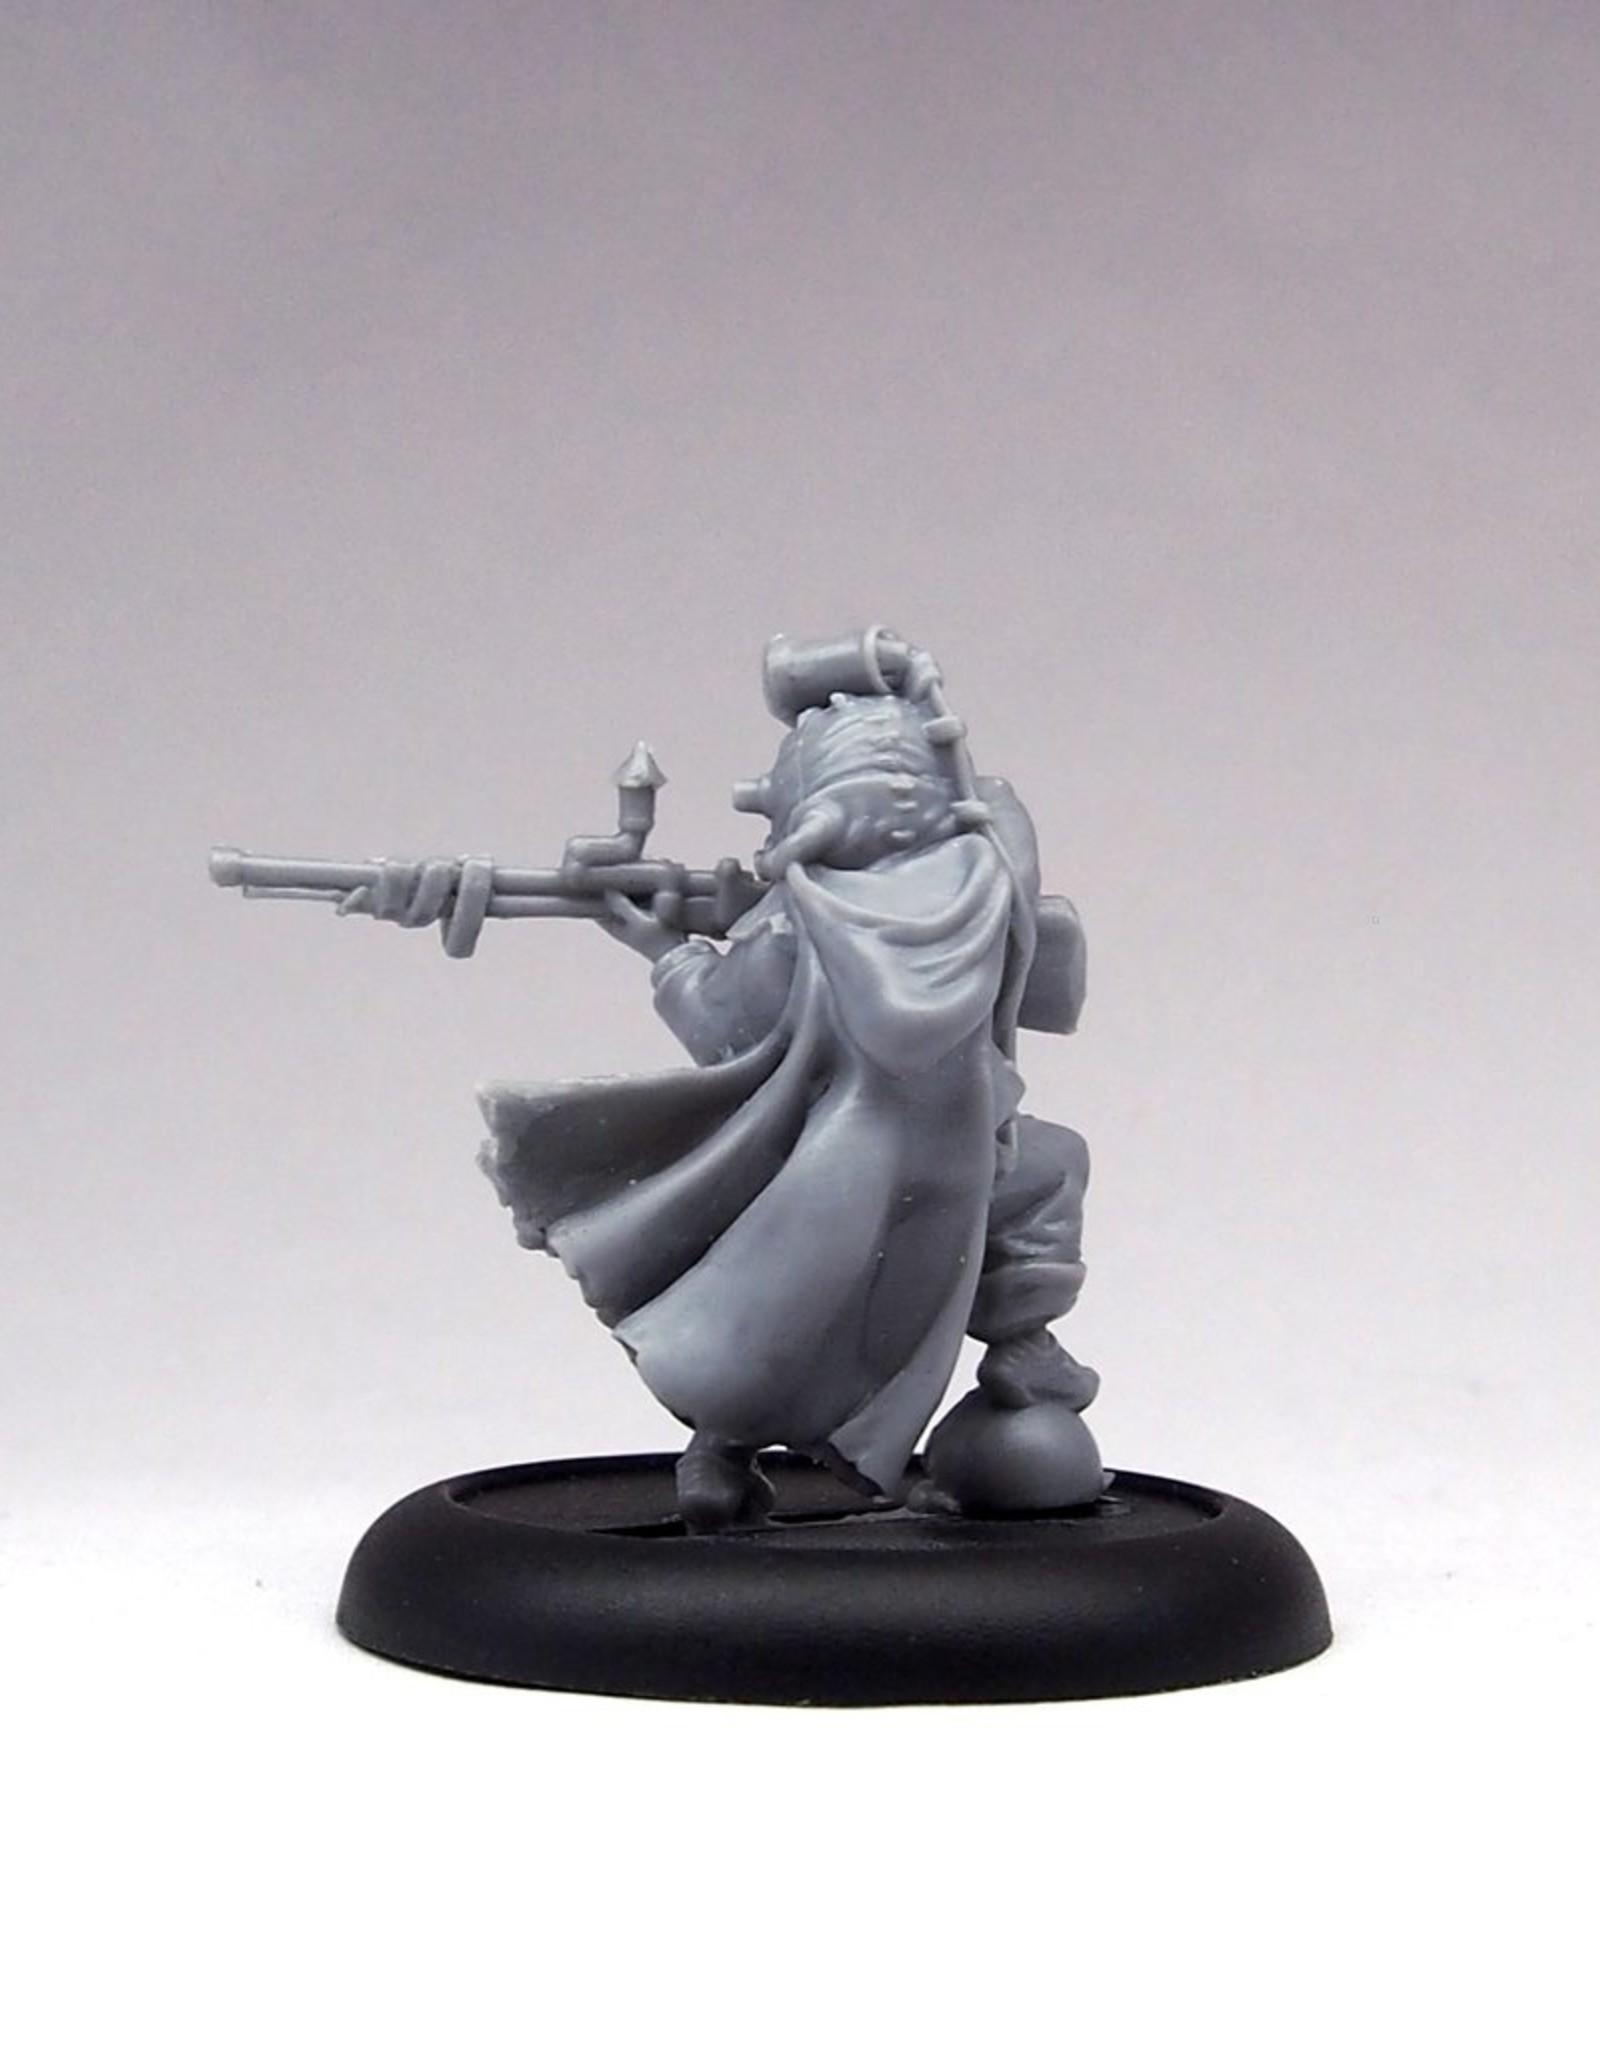 Demented Games Urkin Shooter - Scope - Resin